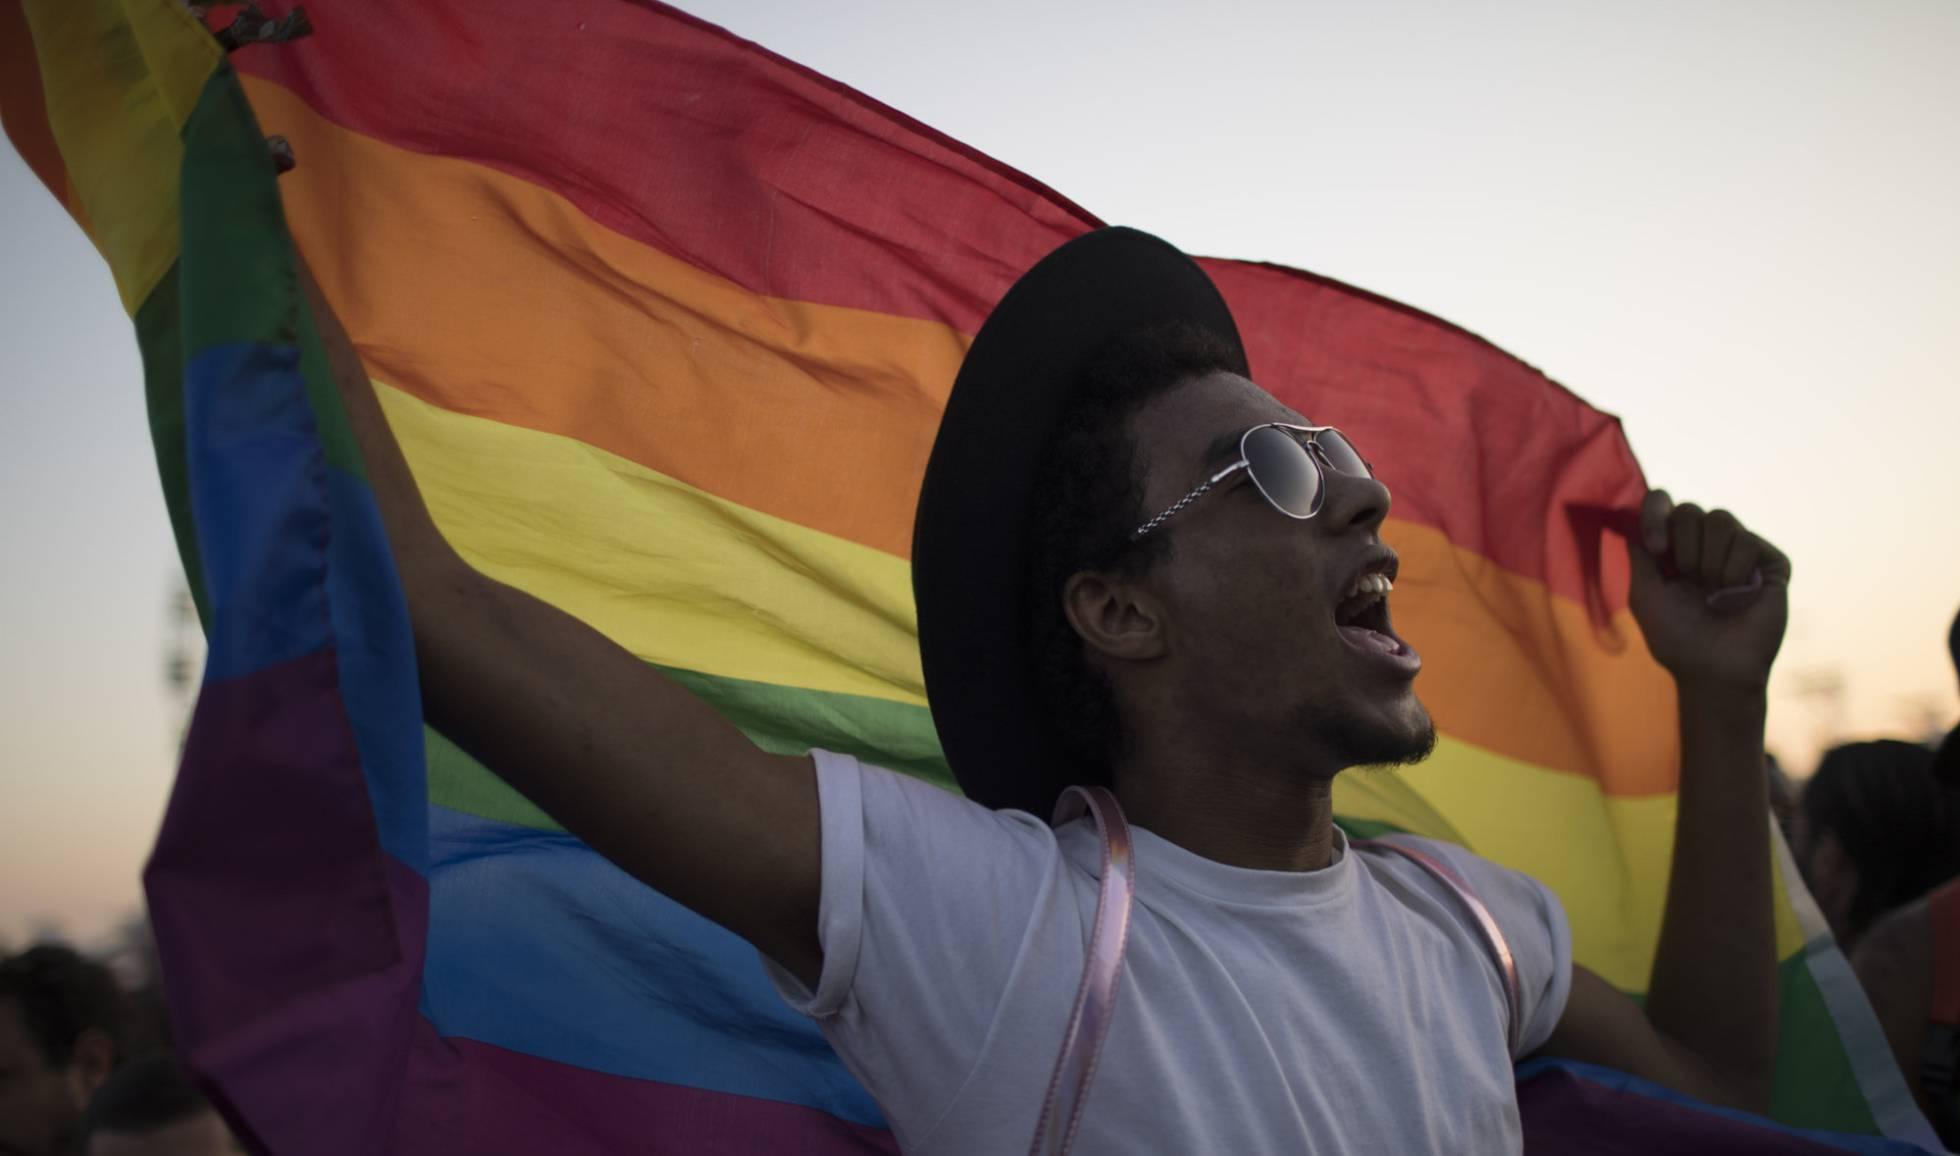 A visibilidade trans é tema de debate no encontro 'Gênero e diversidade' FAAP - EL PAÍS